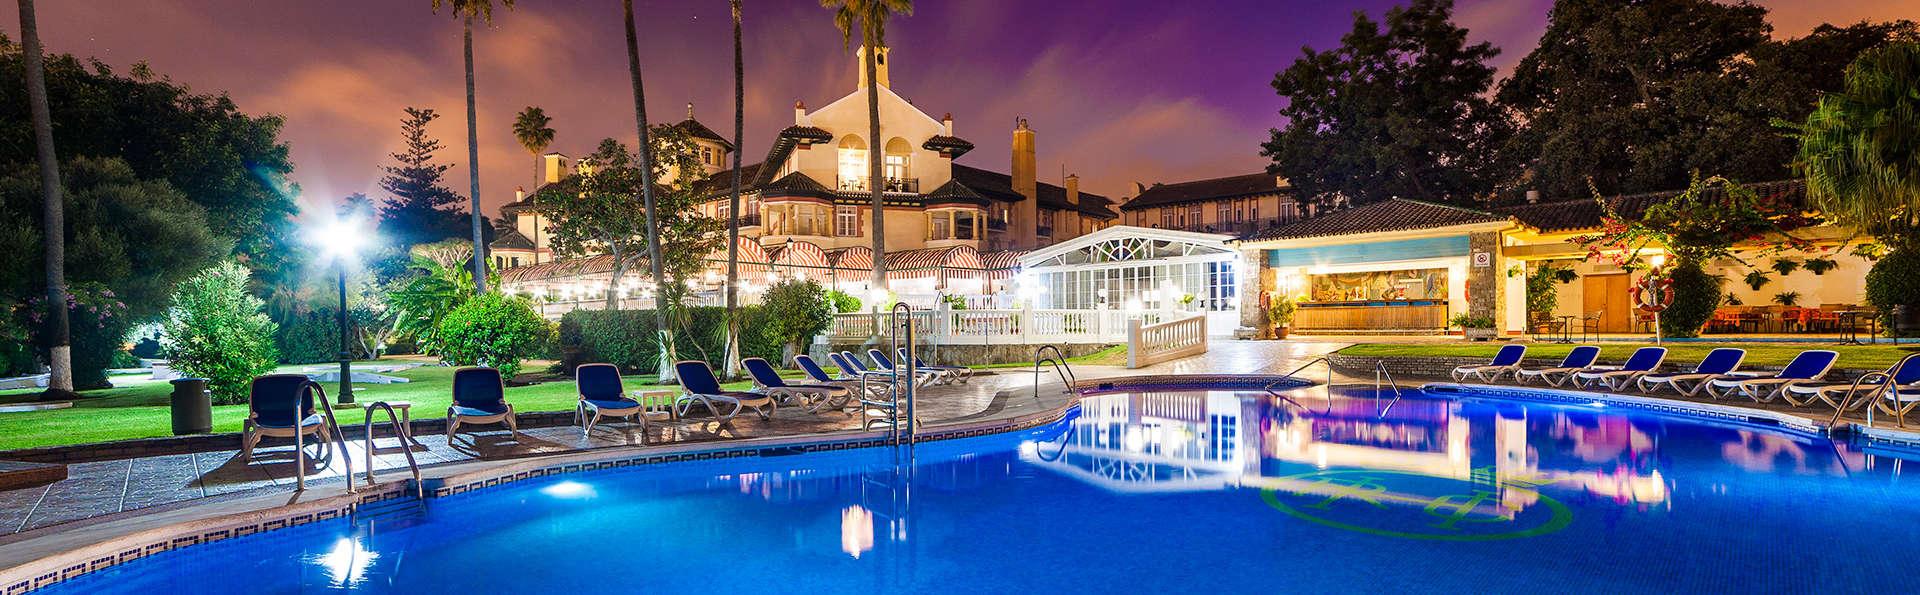 Hotel Globales Reina Cristina - edit_globales-reina-cristina-piscina-nocturna.jpg